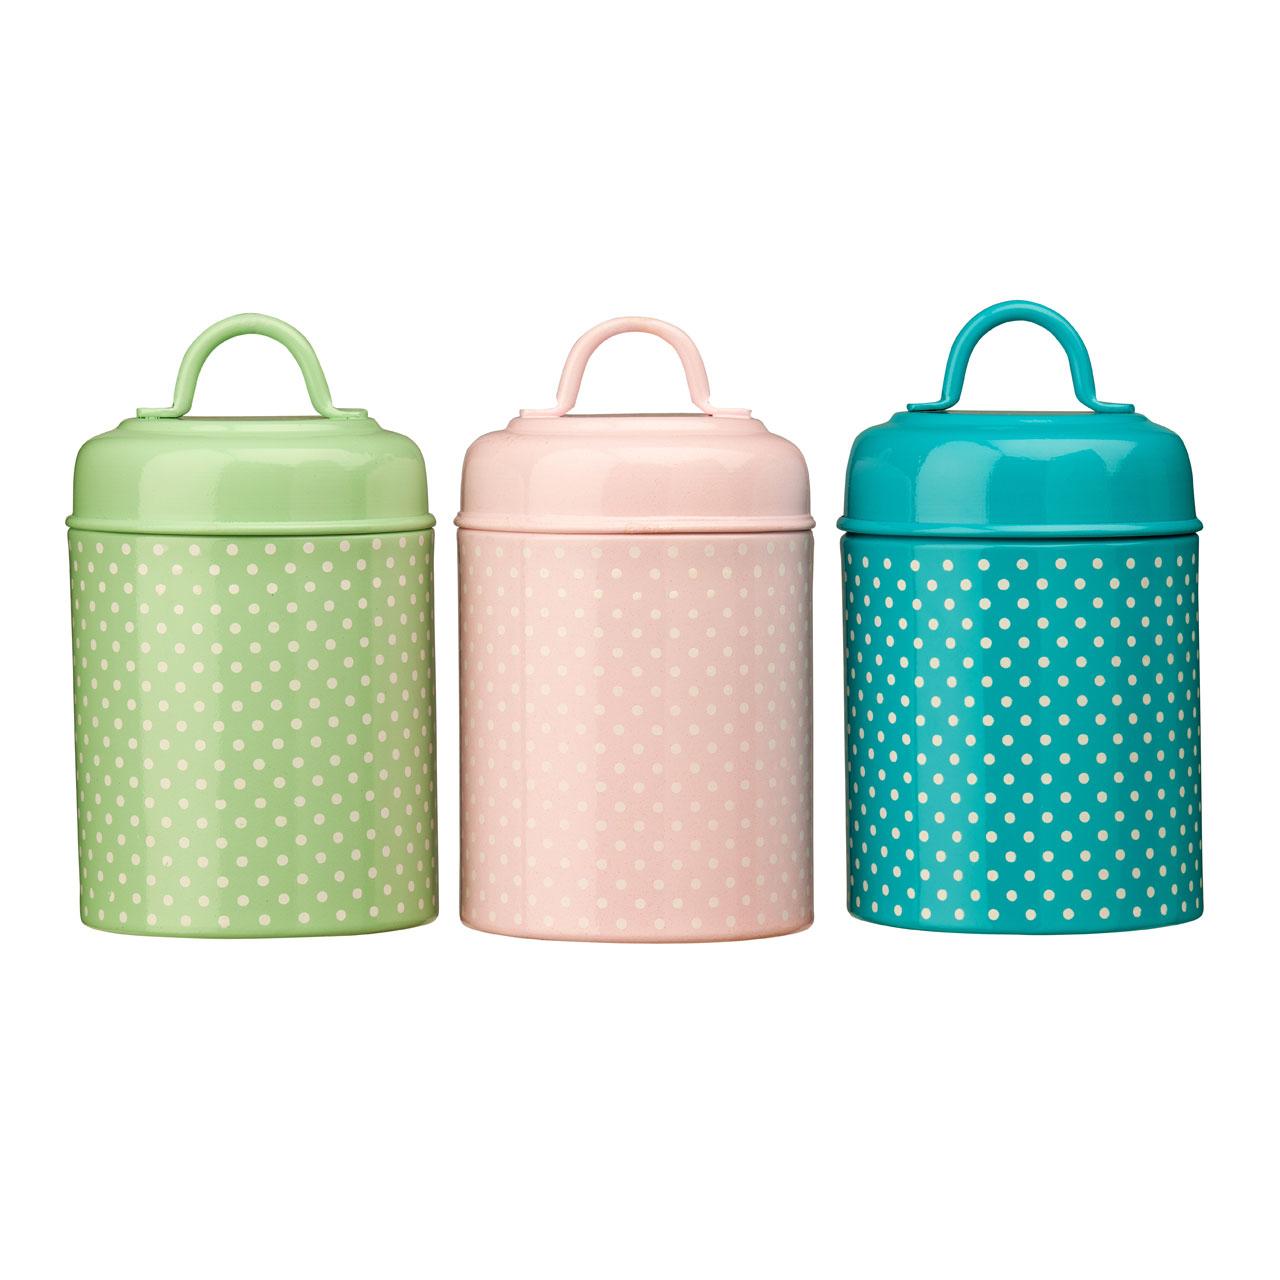 3 polka dot canisters green pink blue kitchen storage tea coffee